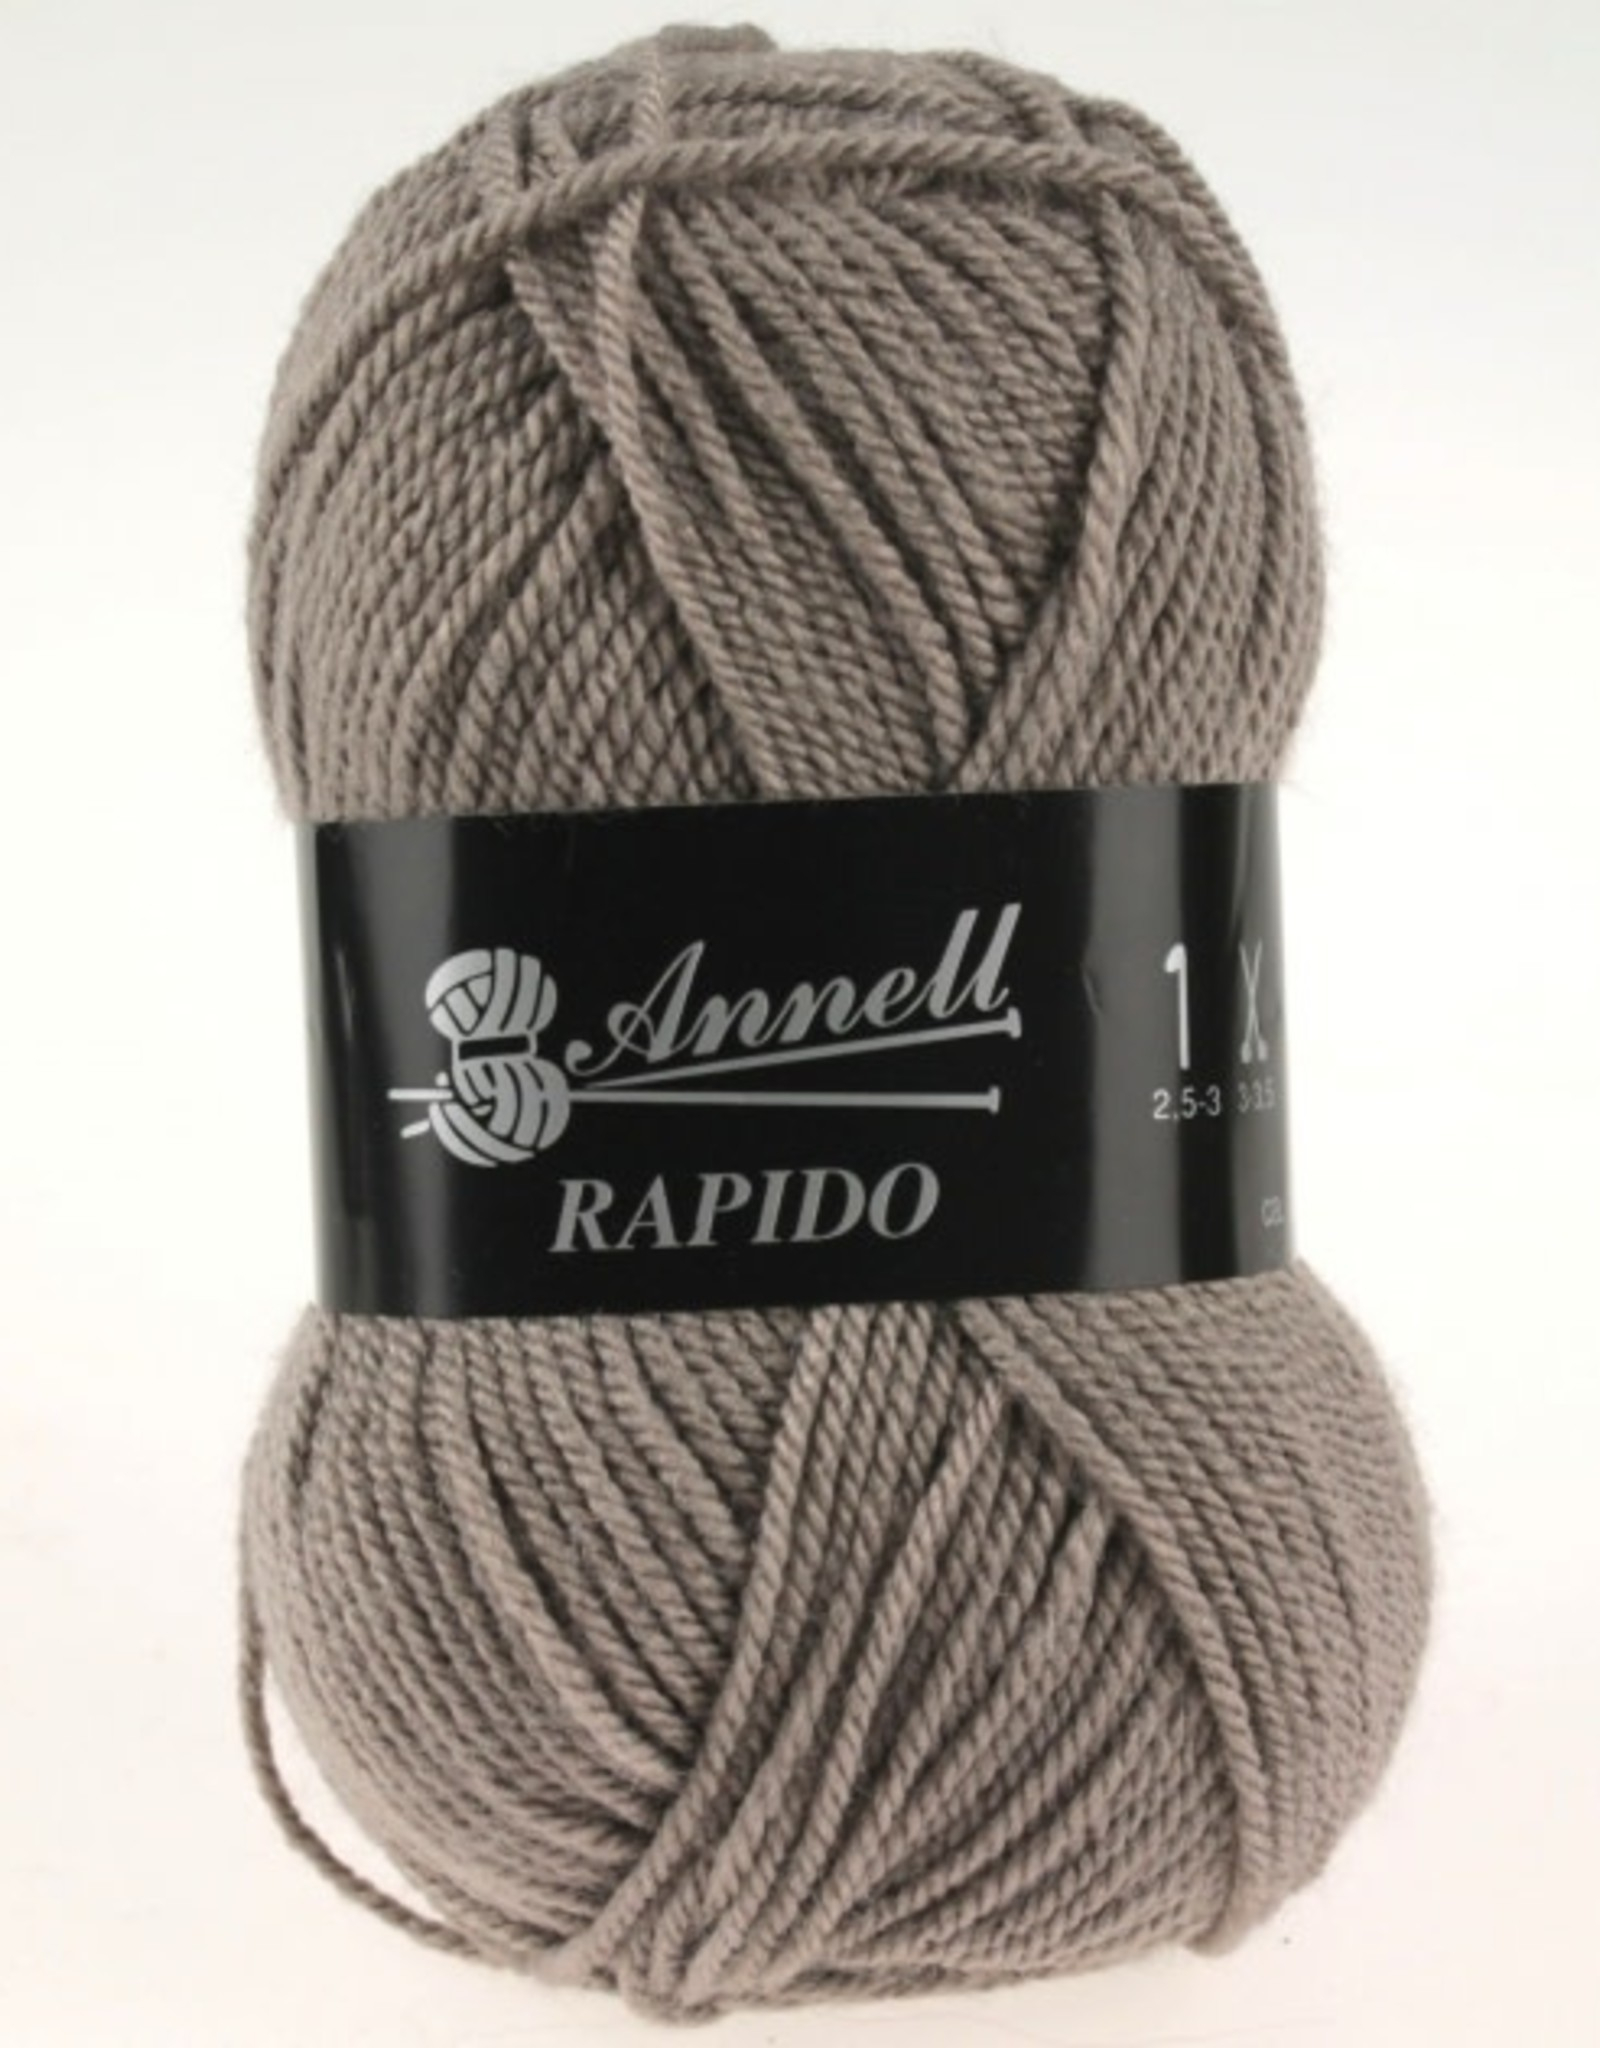 Annell Annell rapido 3229